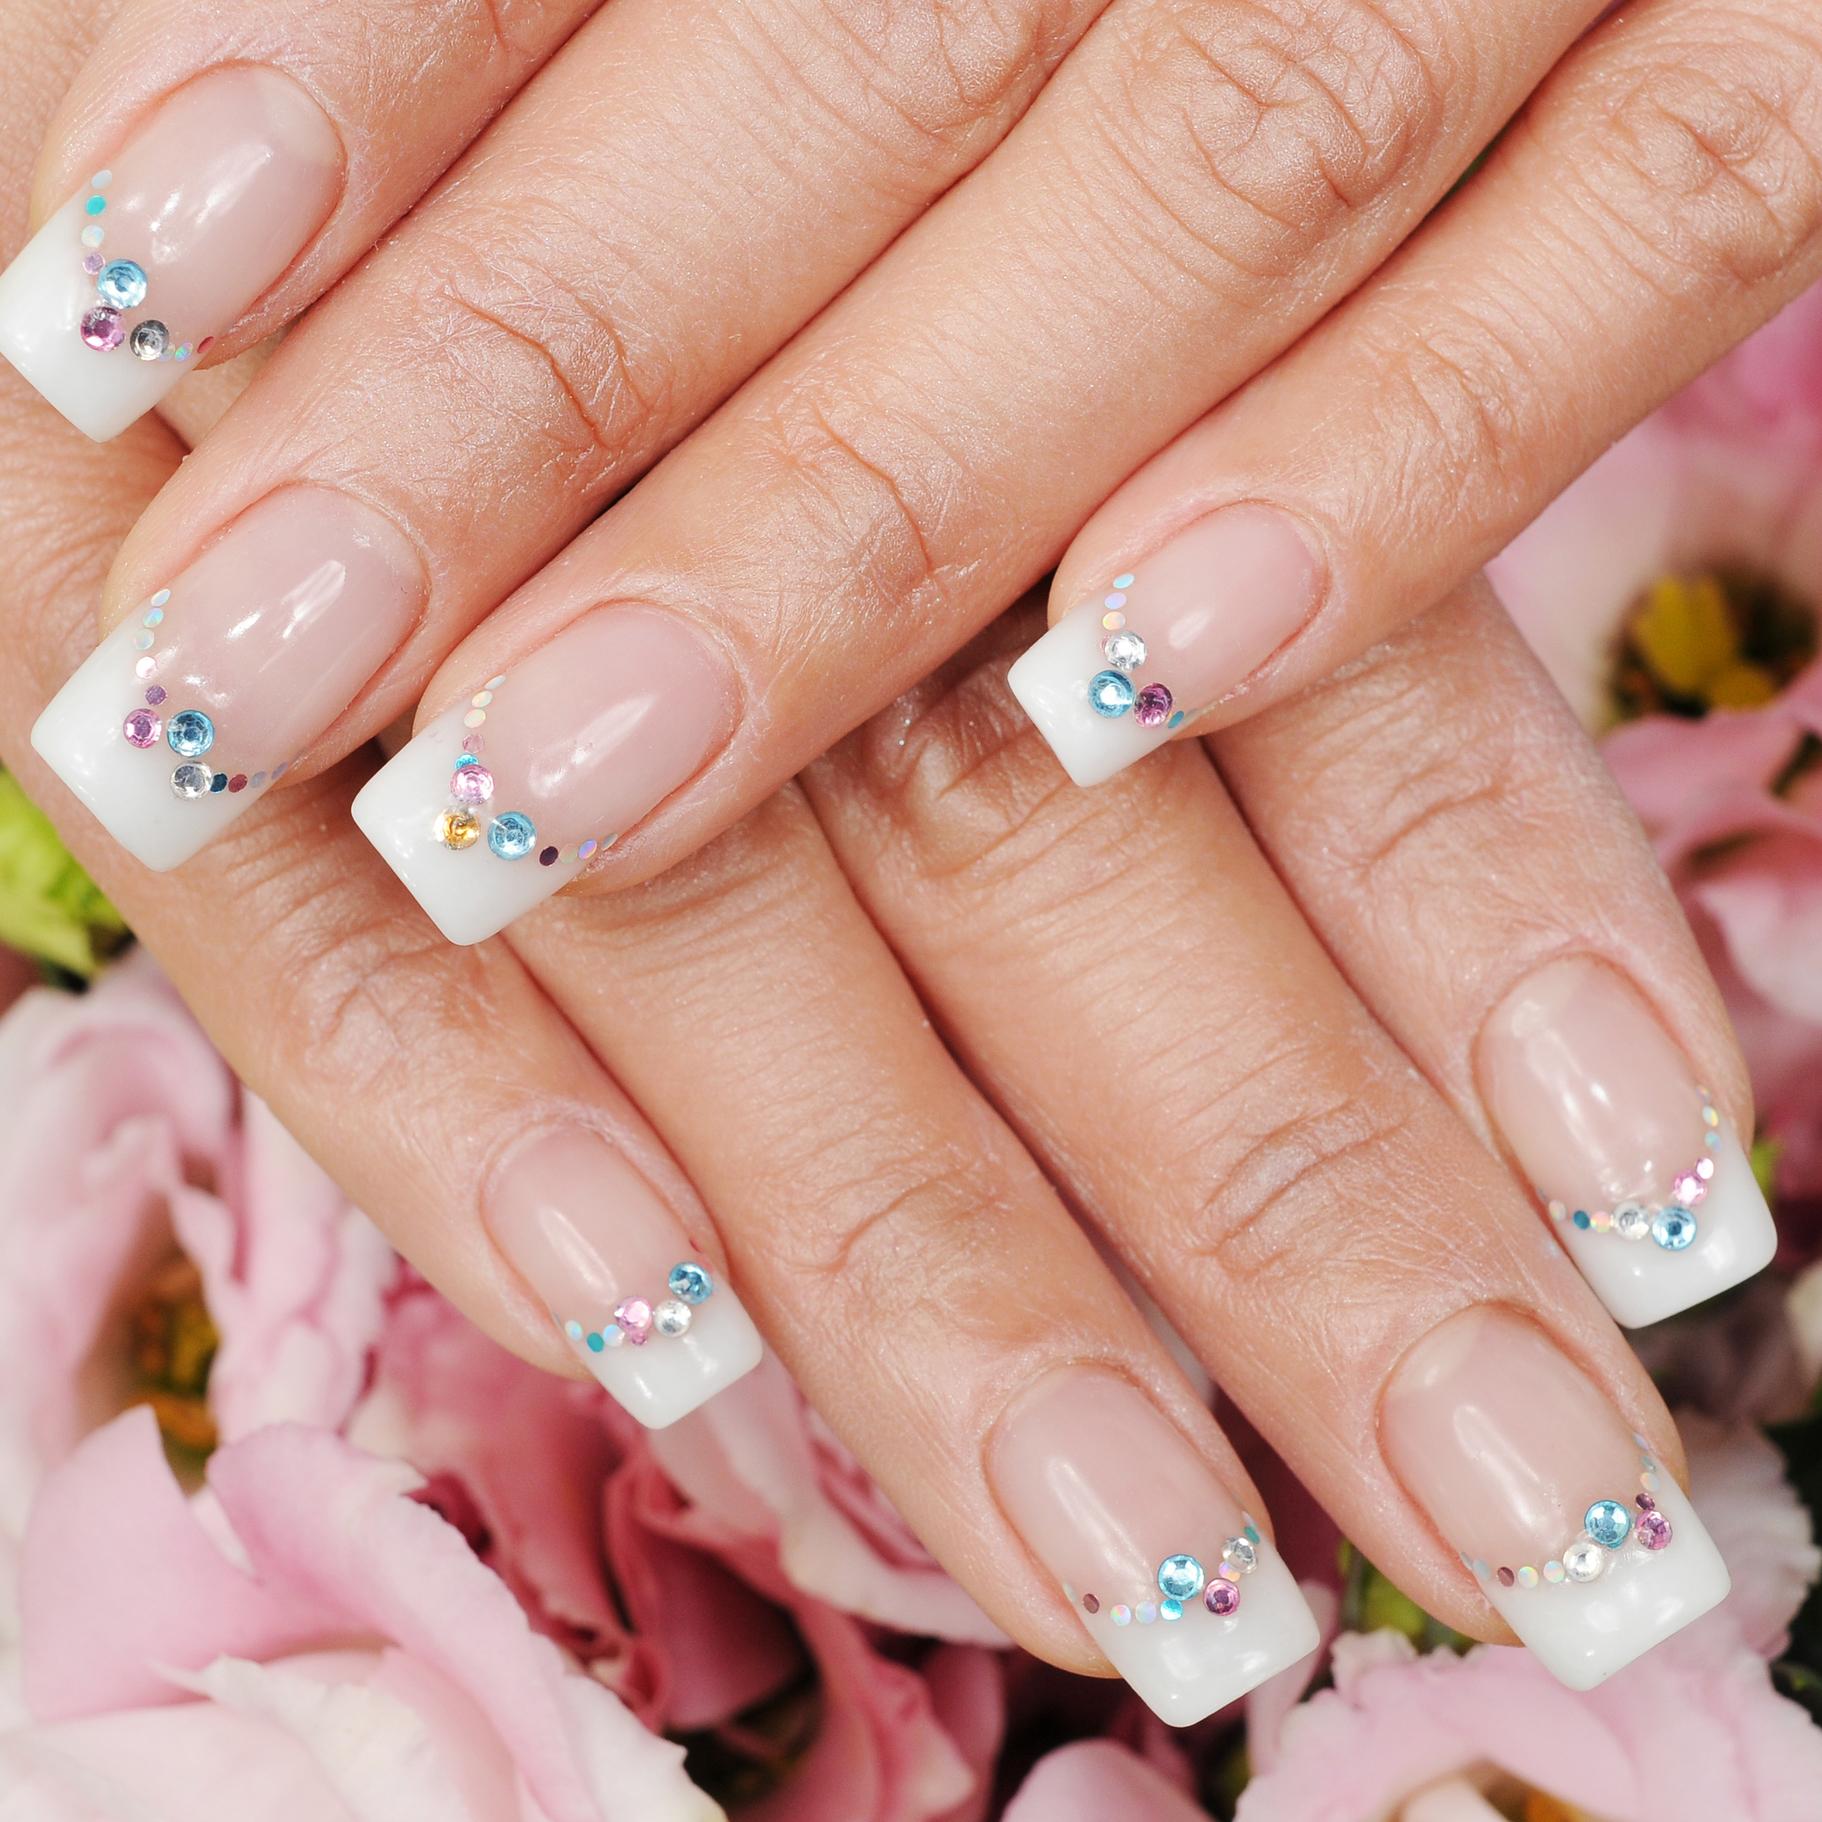 Pink & White Powder Nails